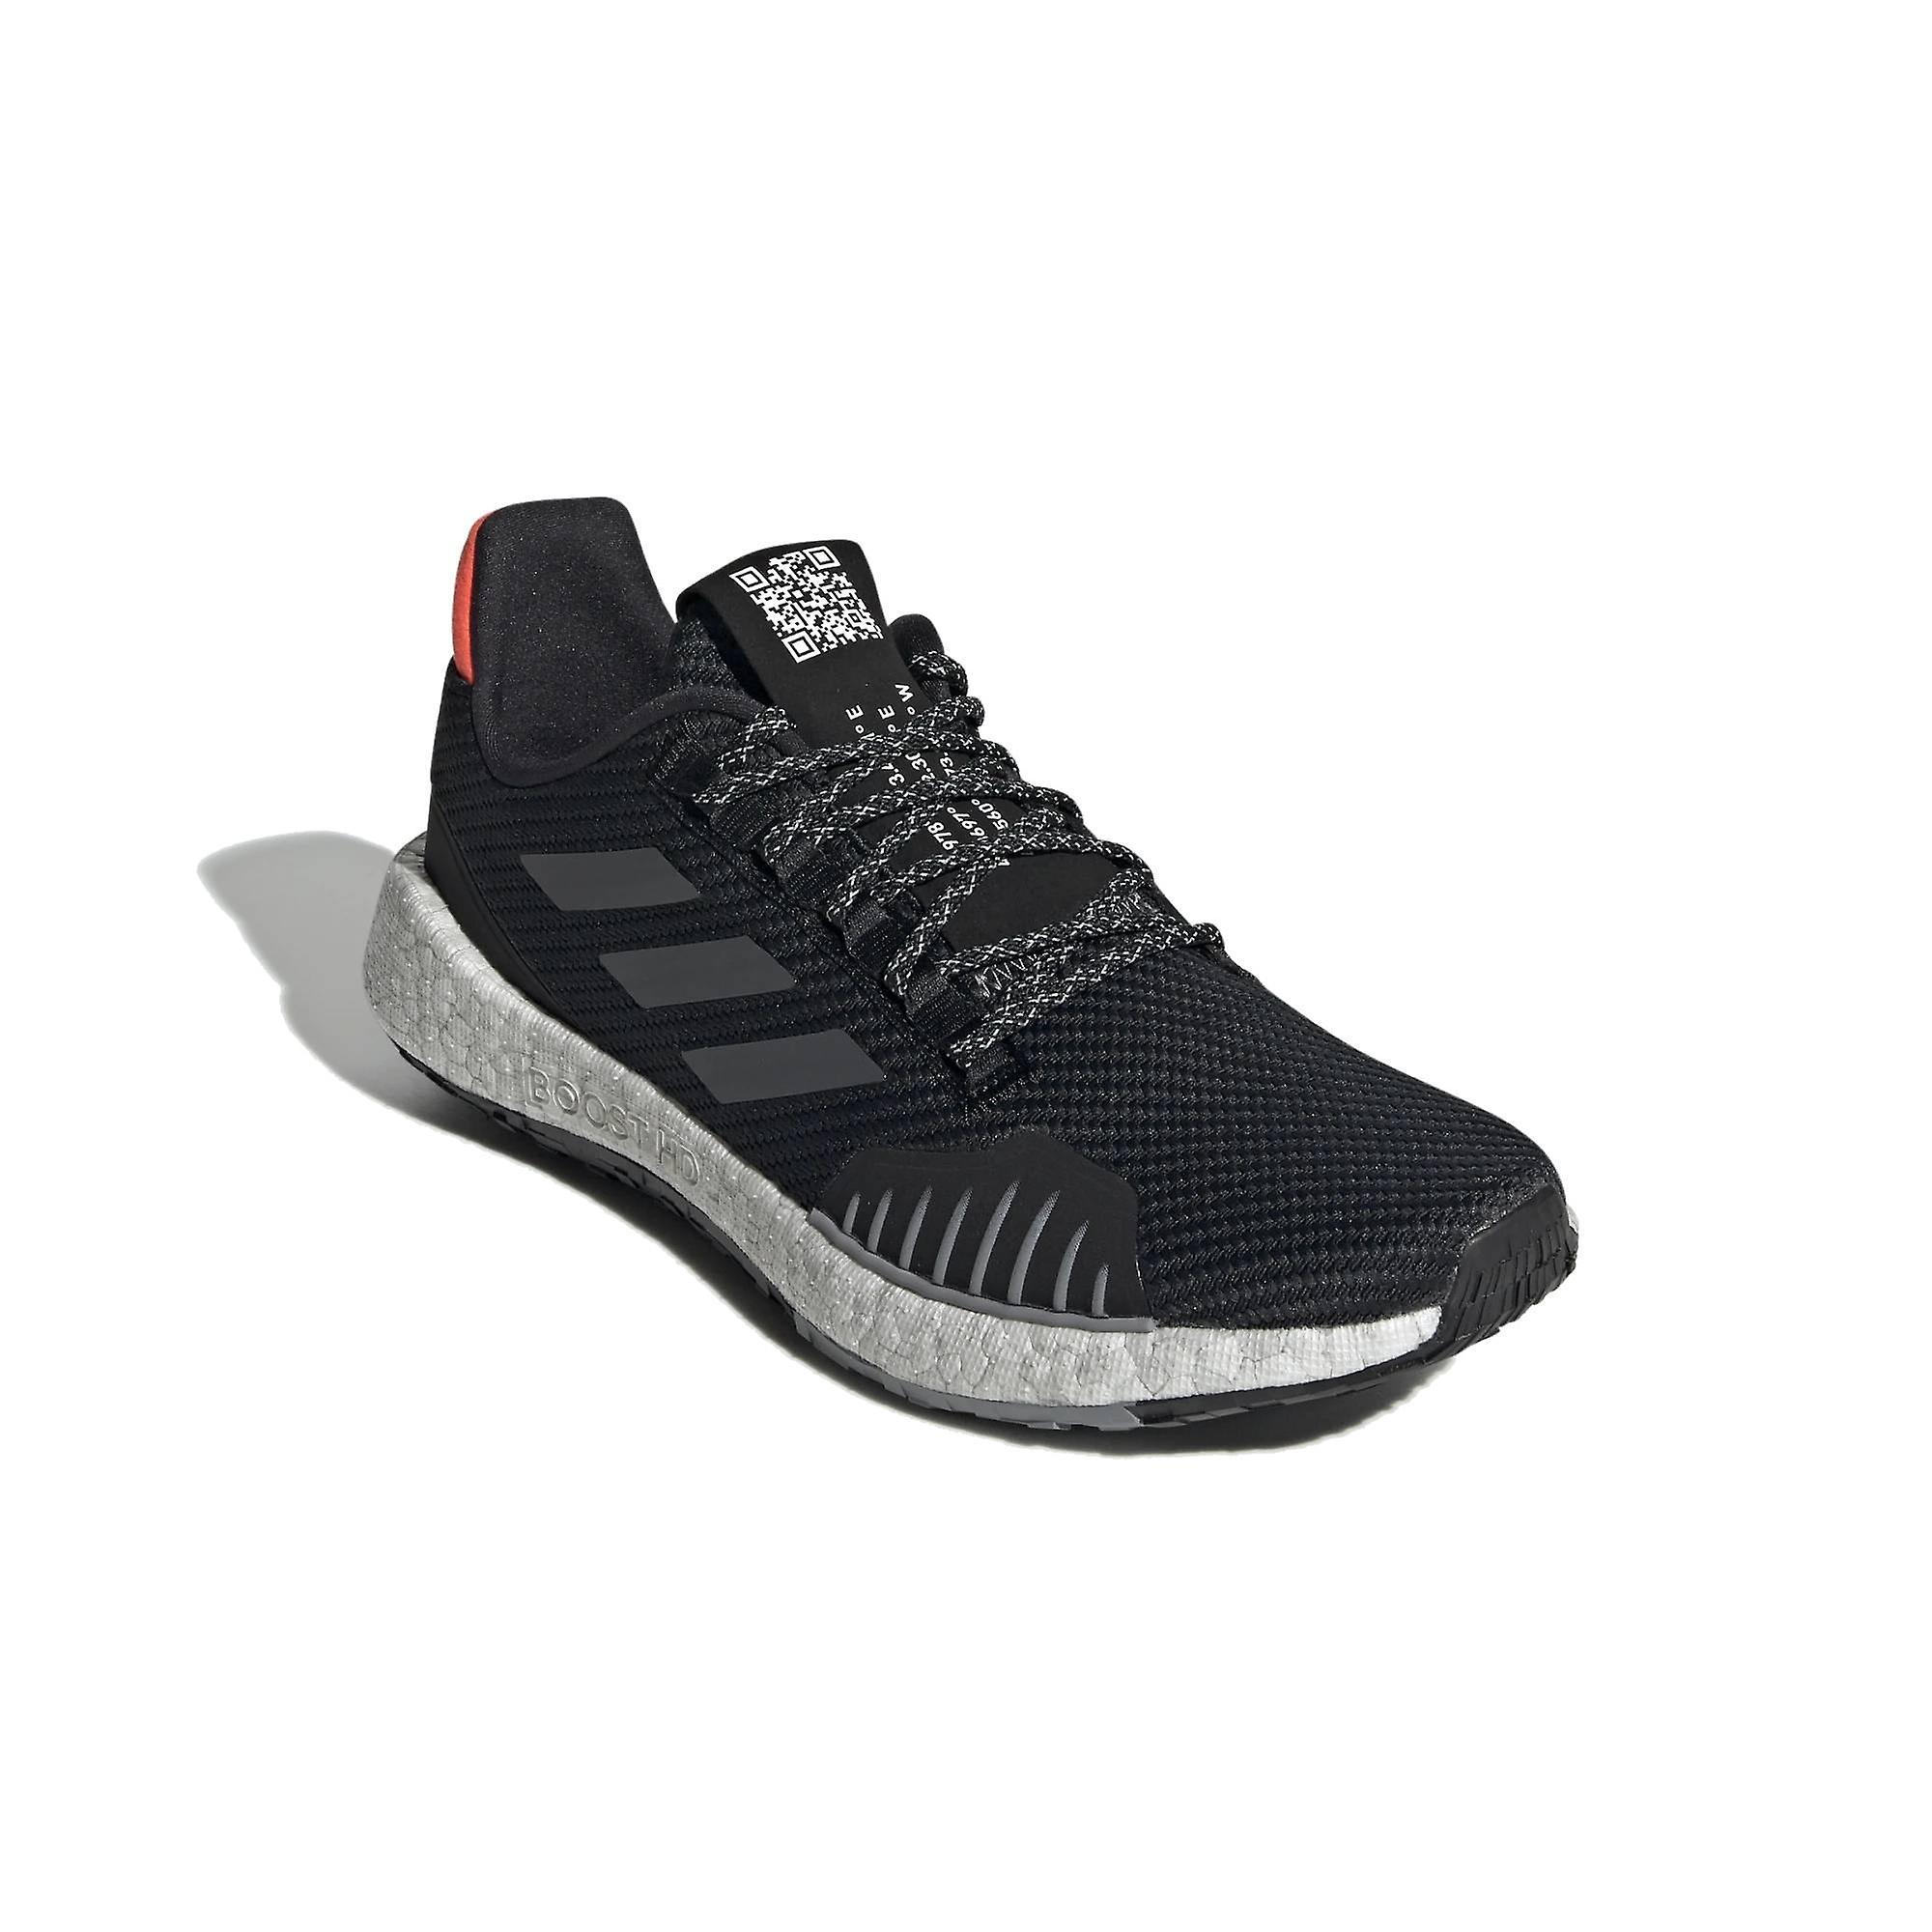 Adidas Mens PulseBOOST HD Winter Running Shoes